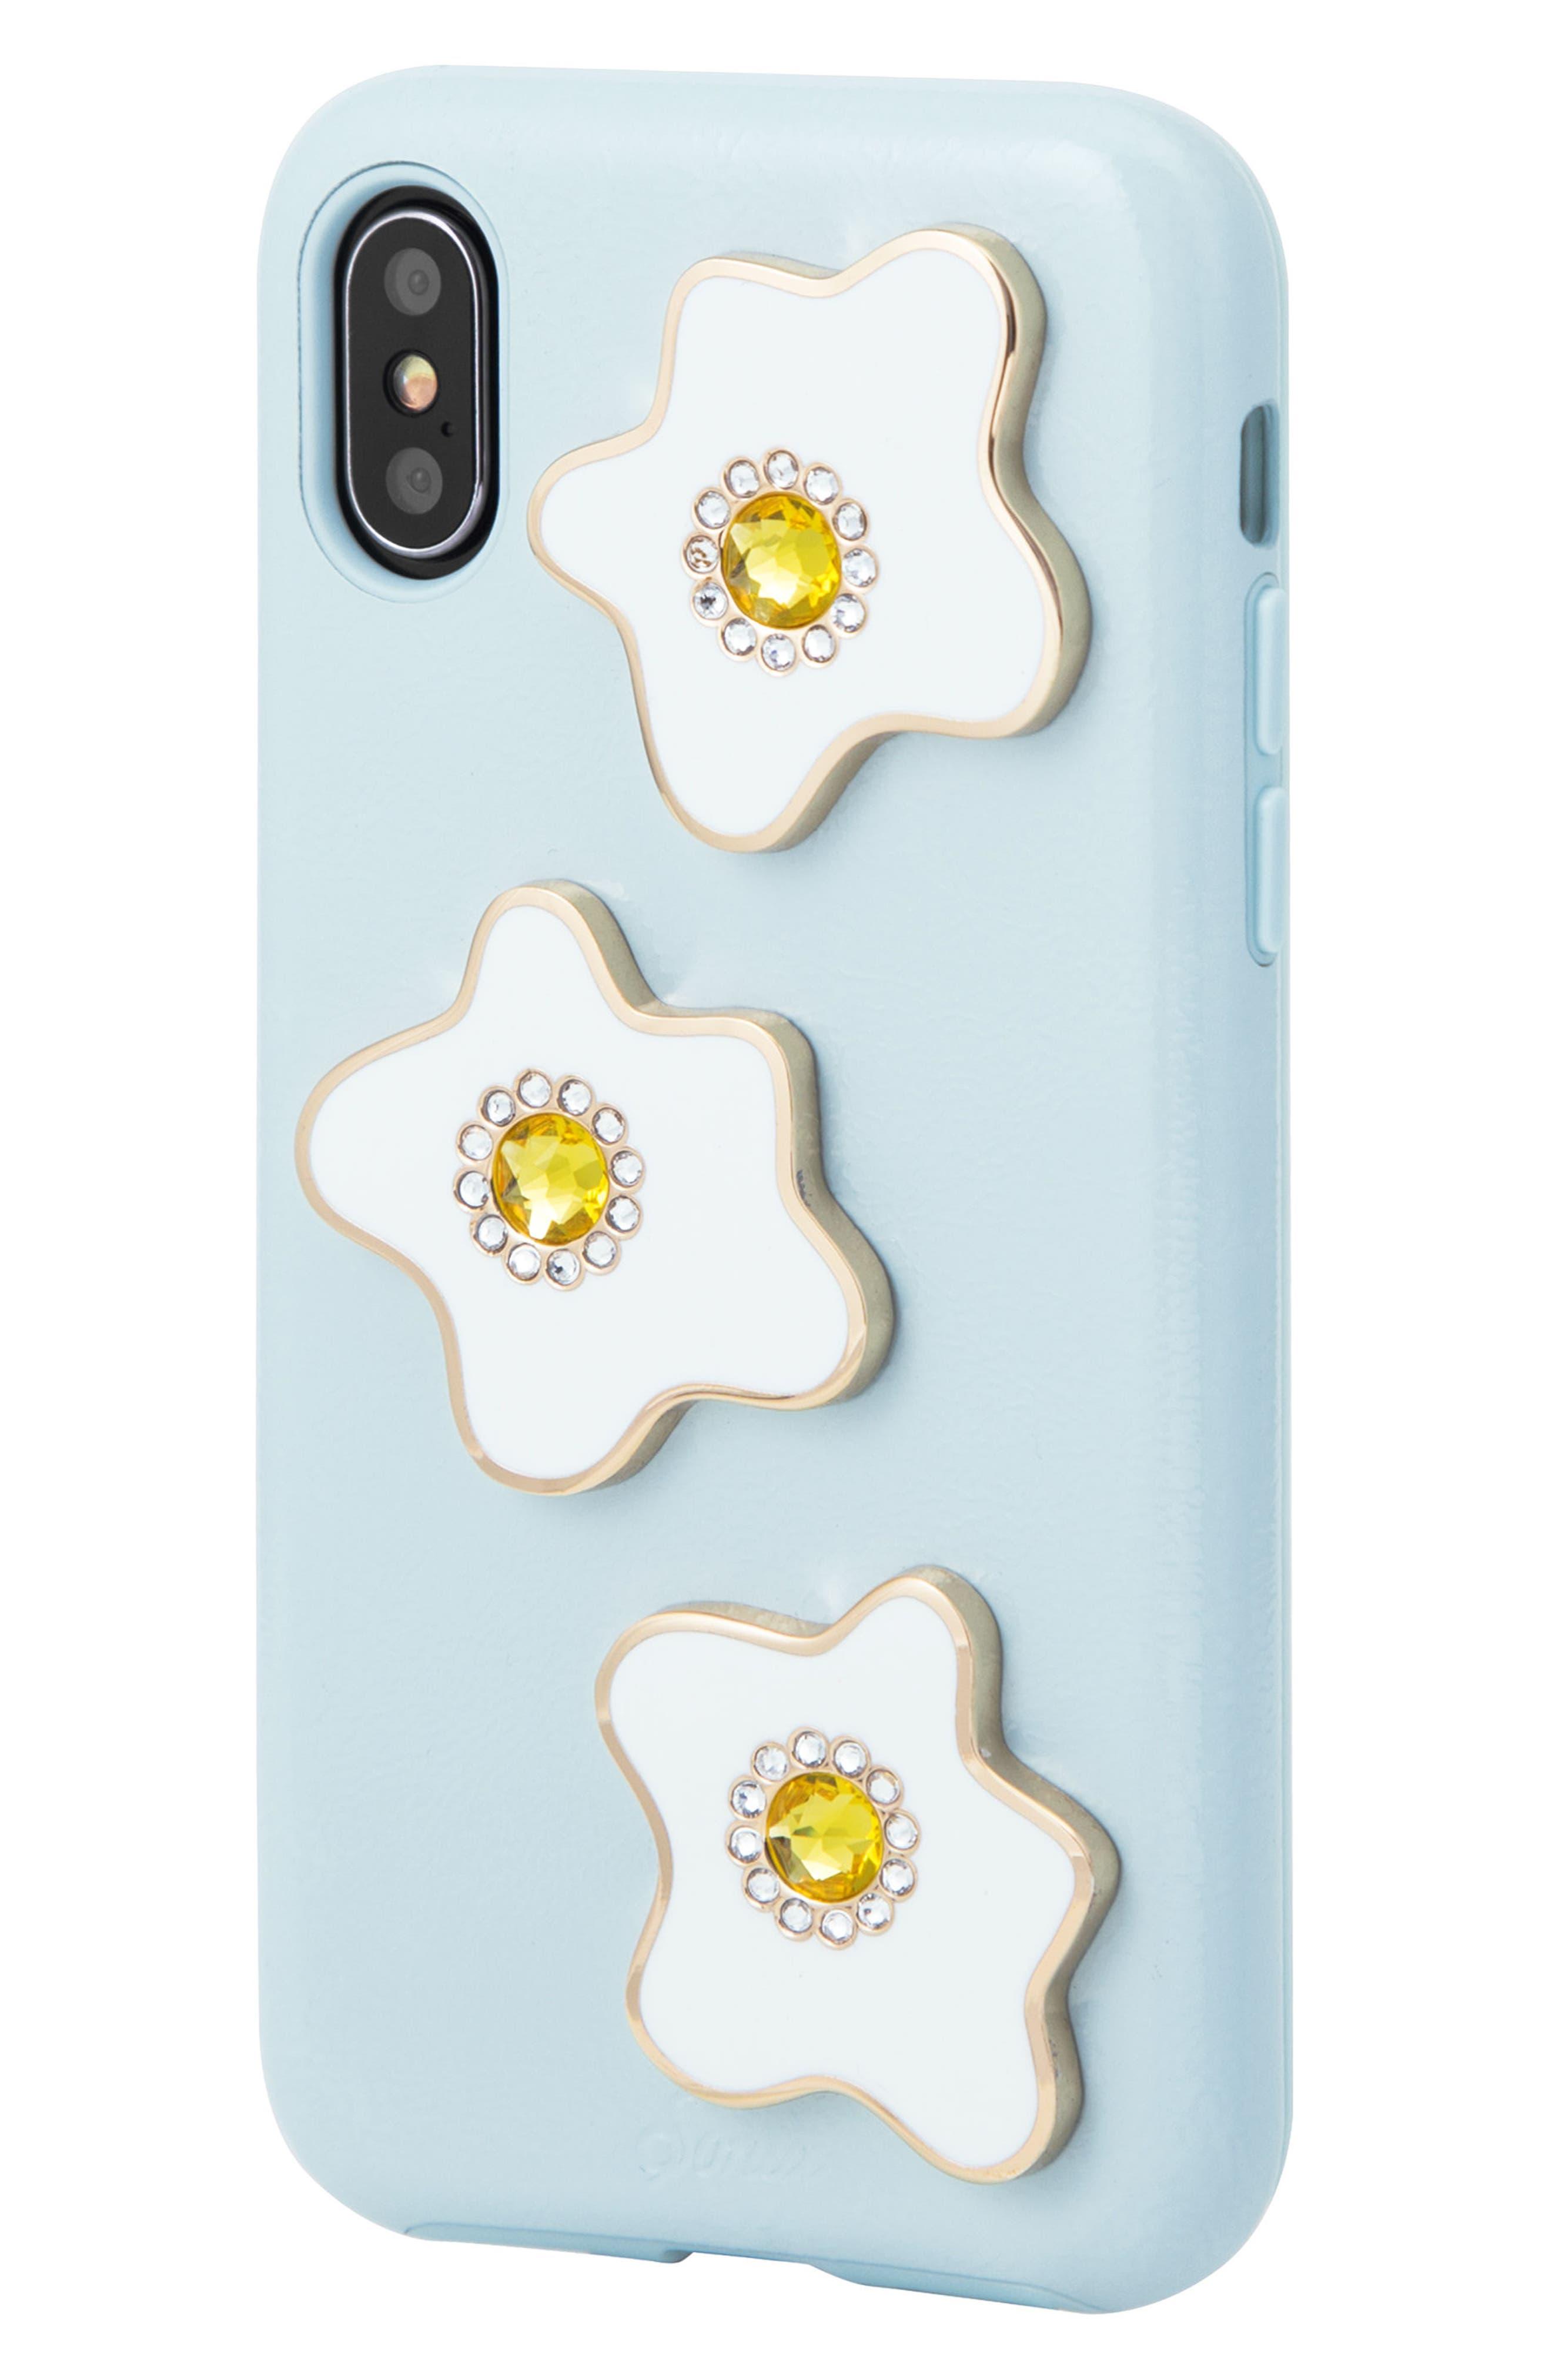 Eggy iPhone X Case,                             Alternate thumbnail 2, color,                             Blue/ White/ Yellow